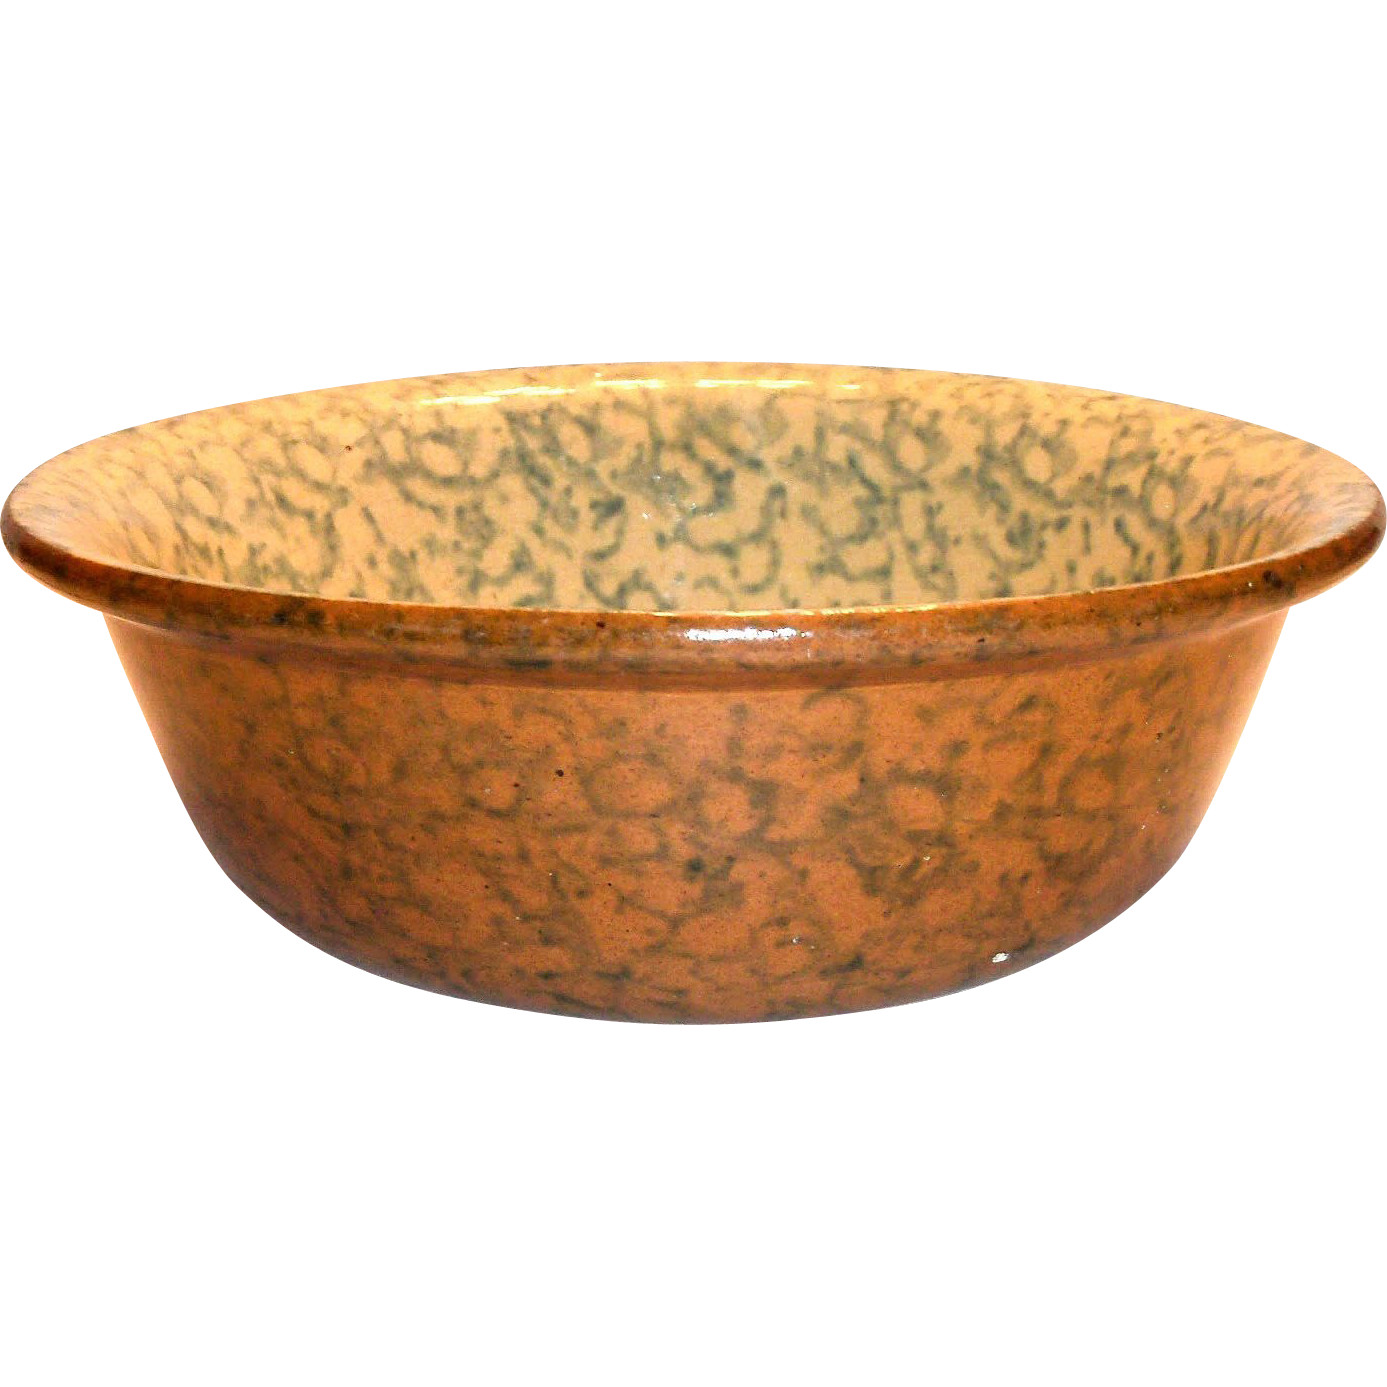 Two-Tone Spongeware Pottery Bowl